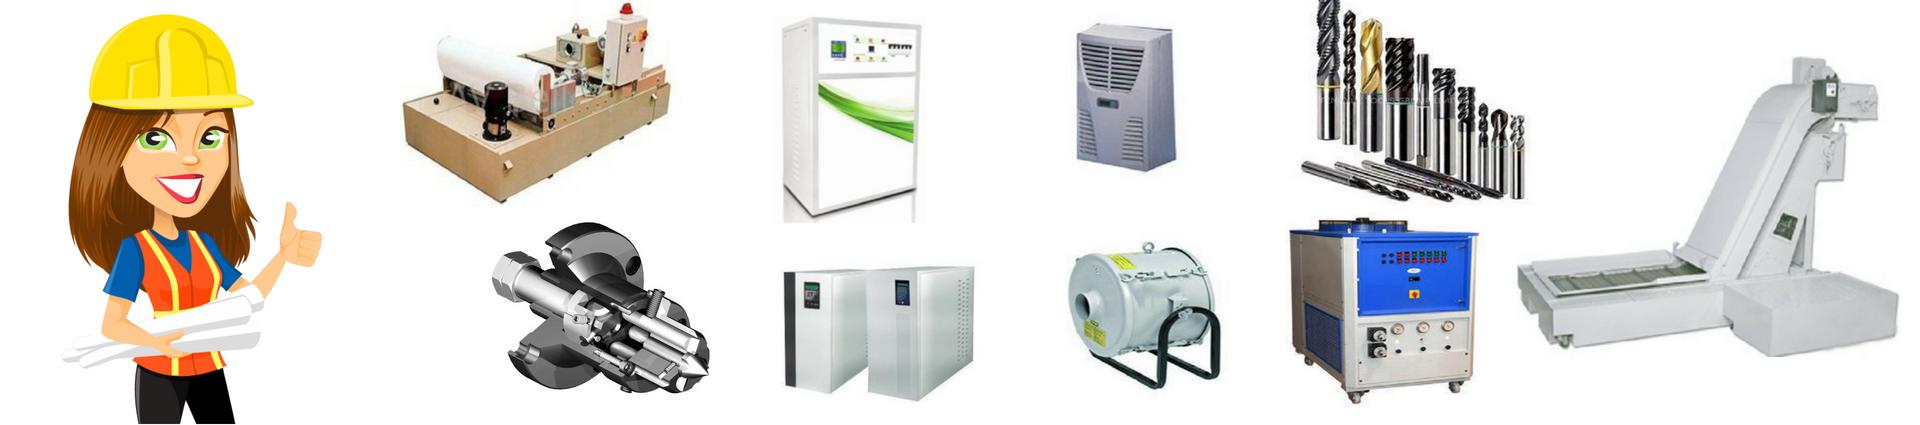 drasla-industrial-equipment-supplier-pune-